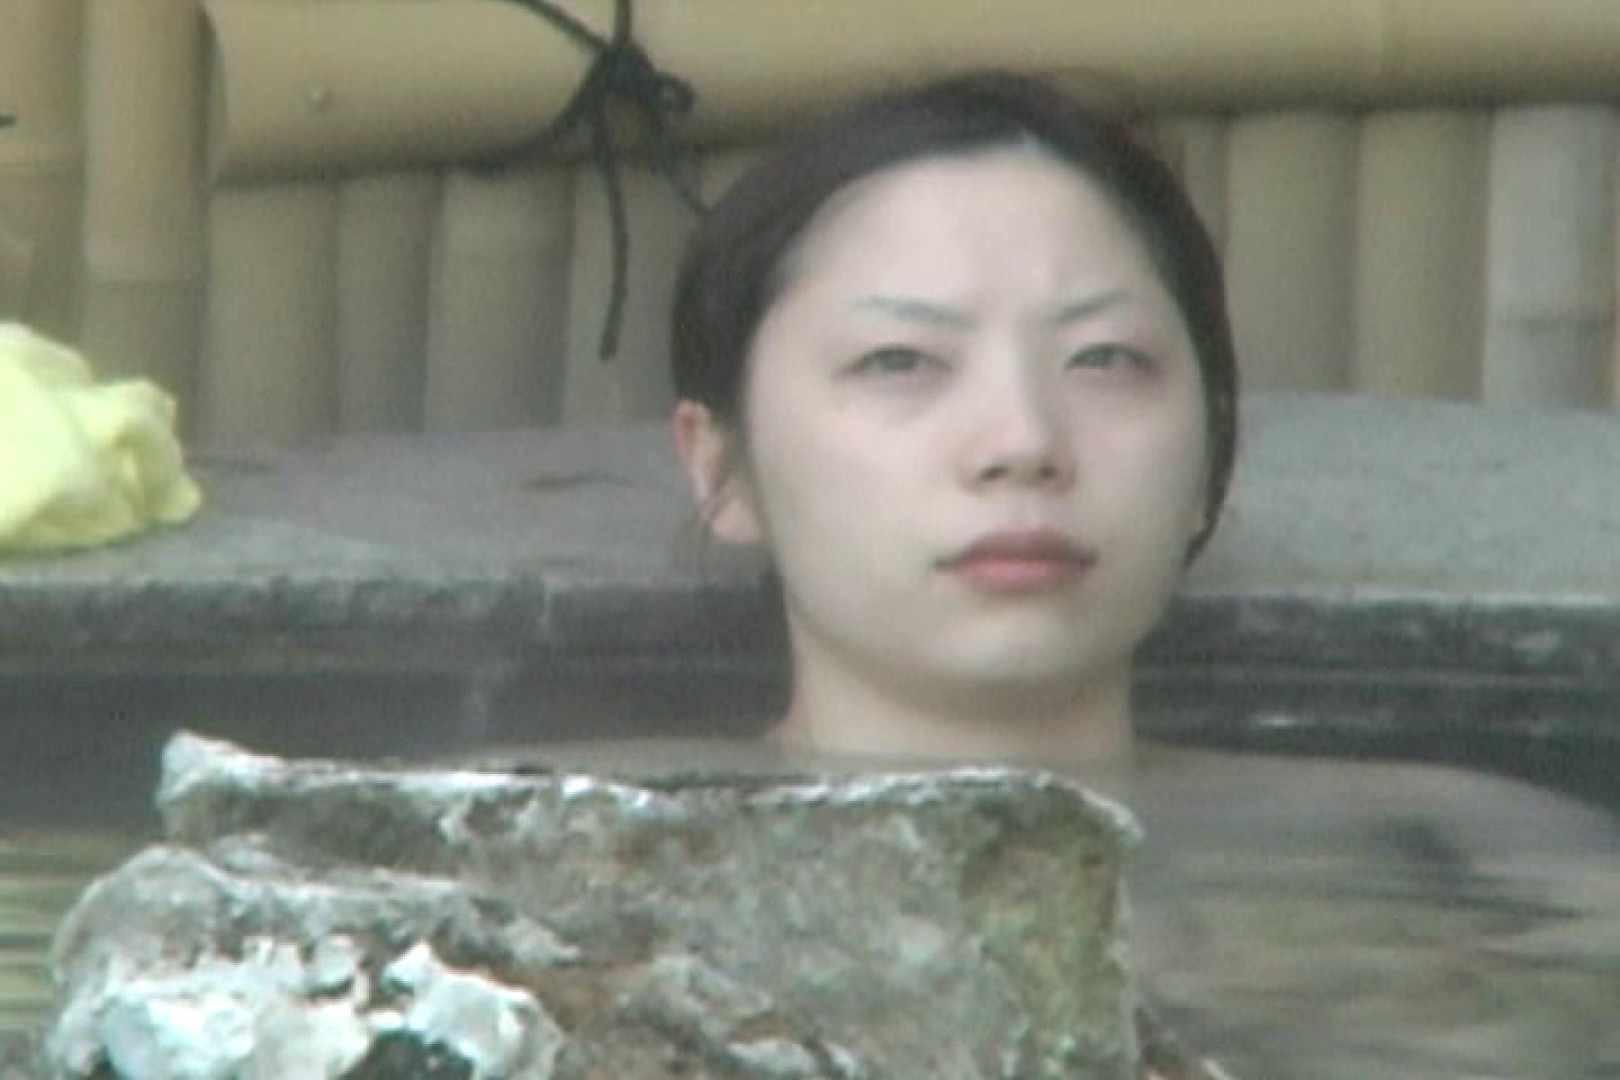 Aquaな露天風呂Vol.596 盗撮シリーズ | 露天風呂編  113PIX 61